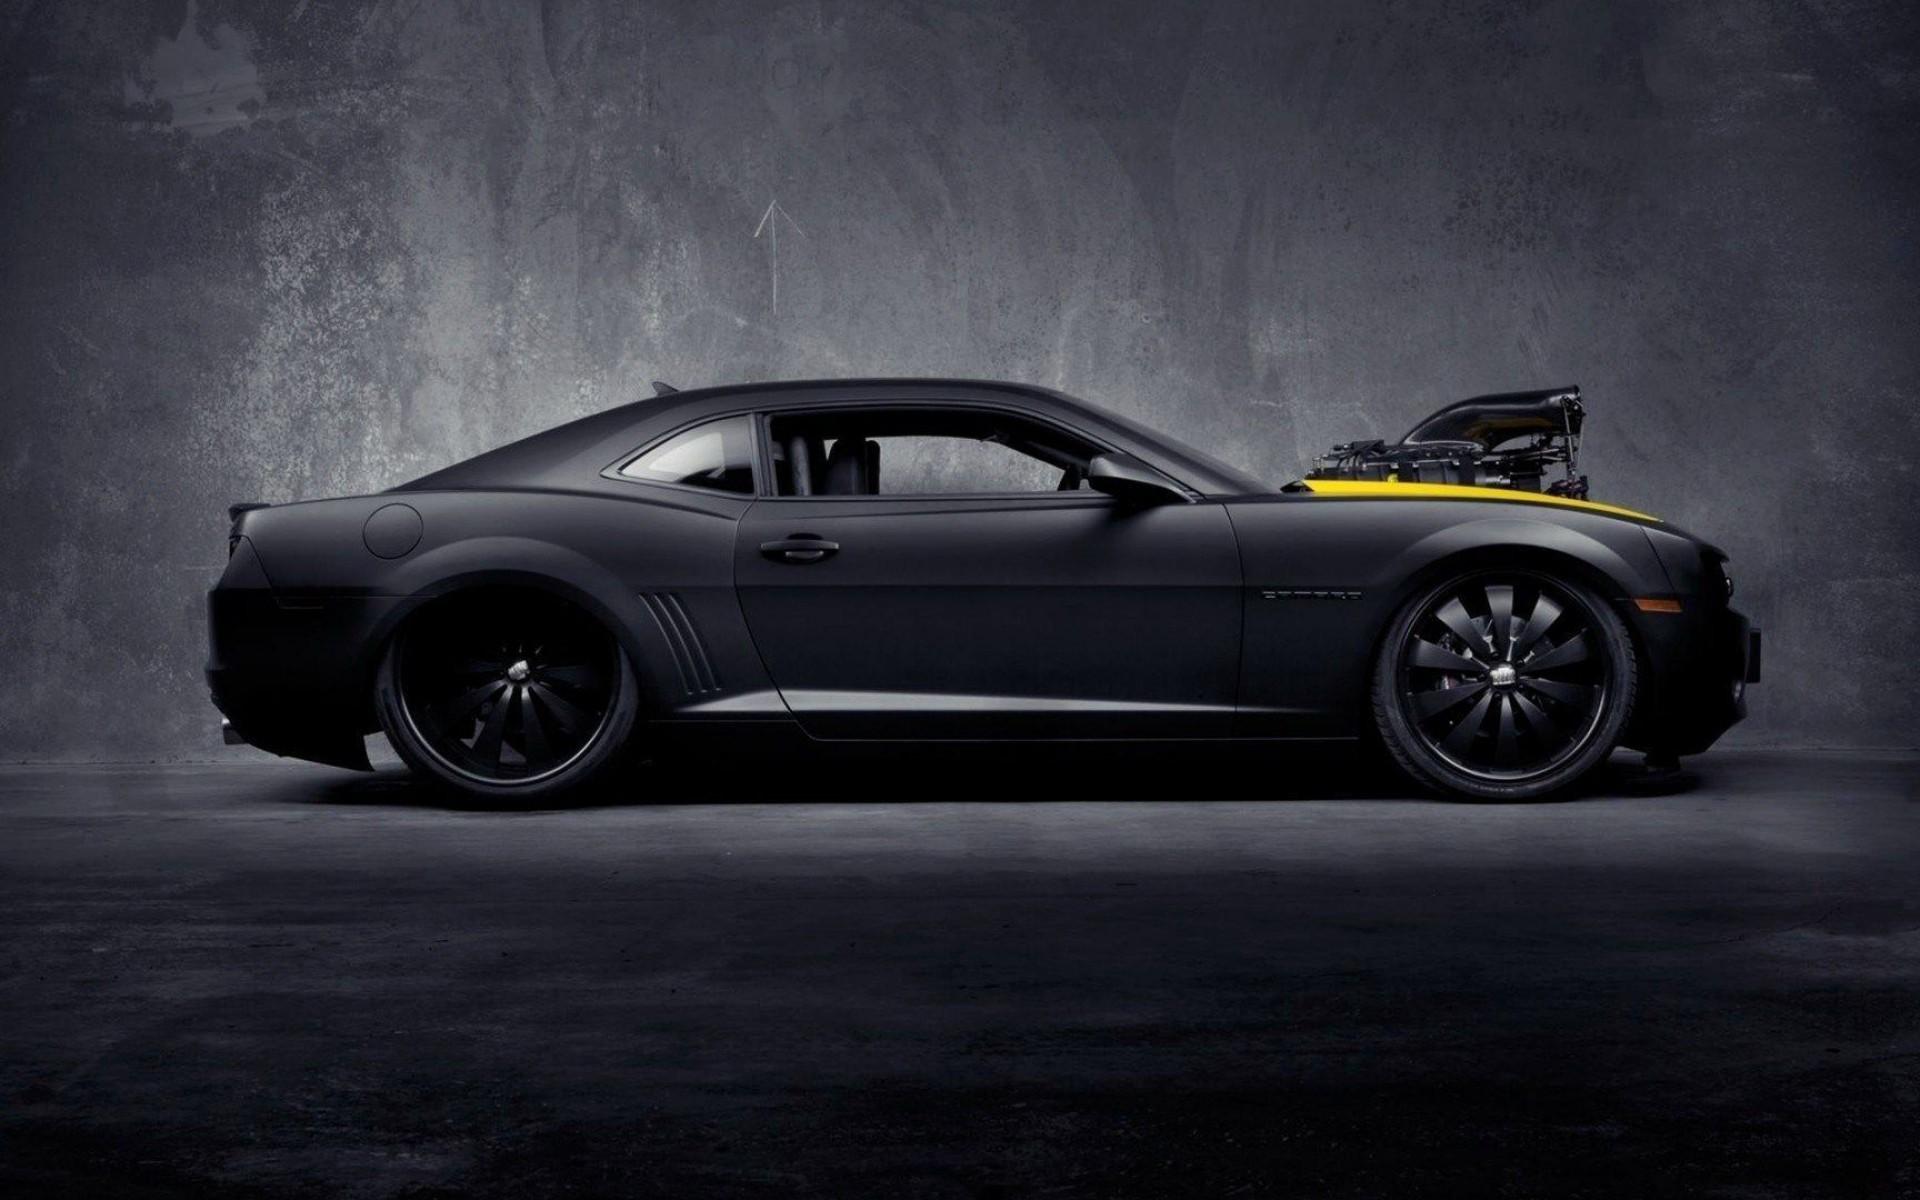 Mustang Vs Camaro >> Black Cars Wallpaper 10 Cool Hd Wallpaper - Hdblackwallpaper.com